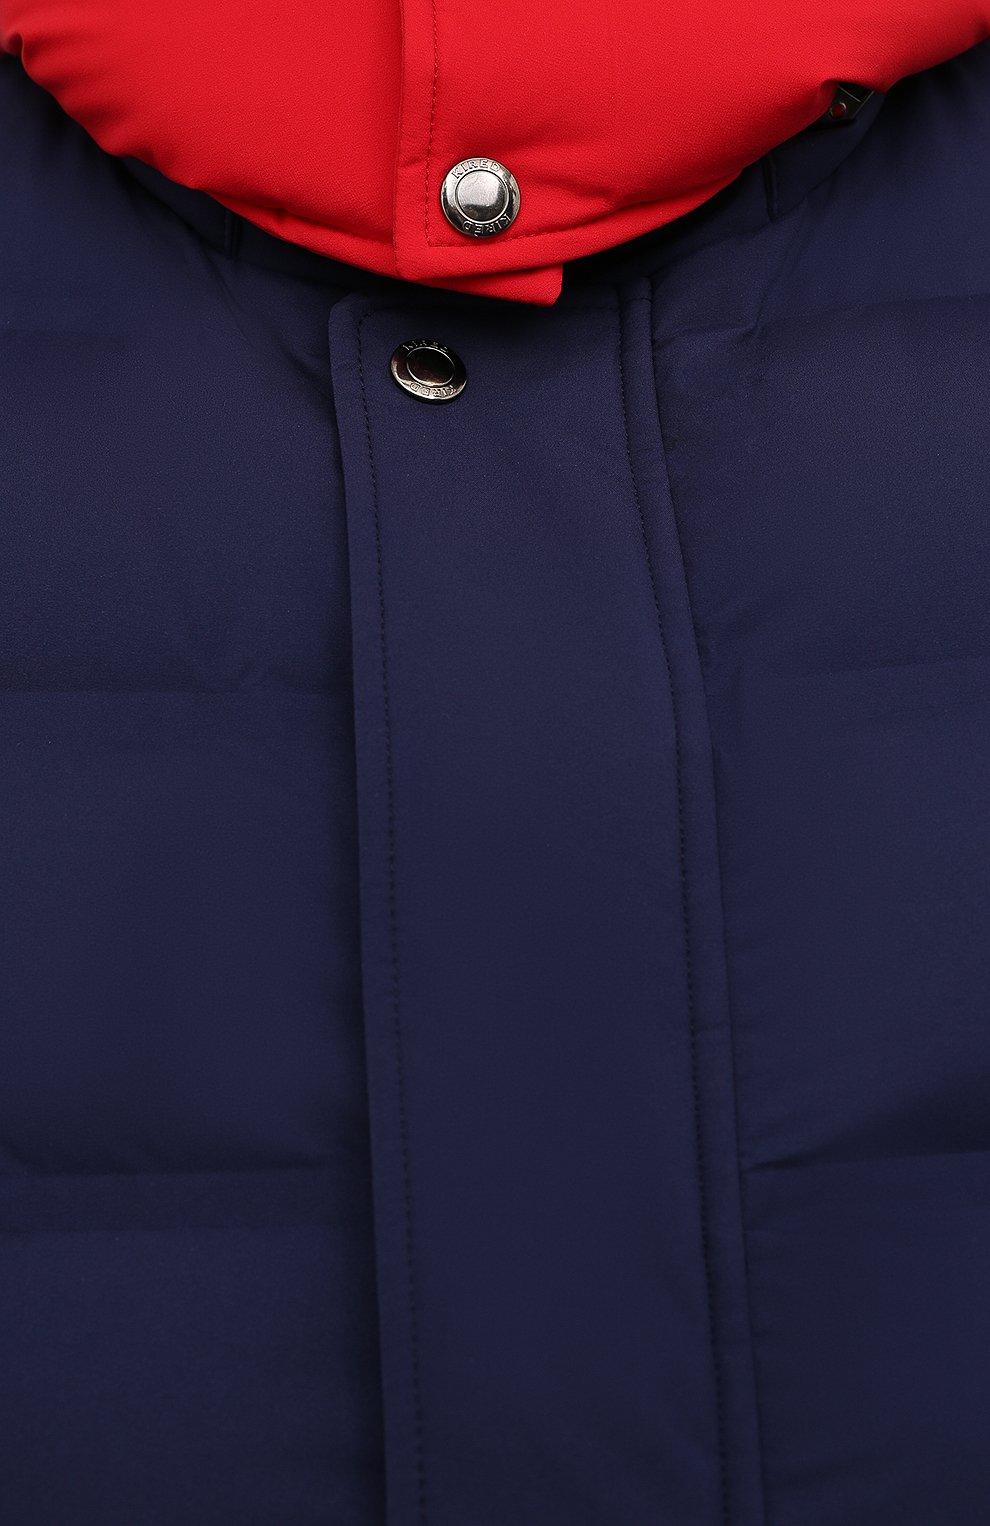 Мужской пуховый жилет KIRED темно-синего цвета, арт. WBREMAW6806518004/62-74 | Фото 5 (Кросс-КТ: Куртка, Пуховик; Big sizes: Big Sizes; Материал внешний: Синтетический материал; Стили: Спорт-шик; Материал подклада: Синтетический материал; Длина (верхняя одежда): Короткие; Материал утеплителя: Пух и перо)